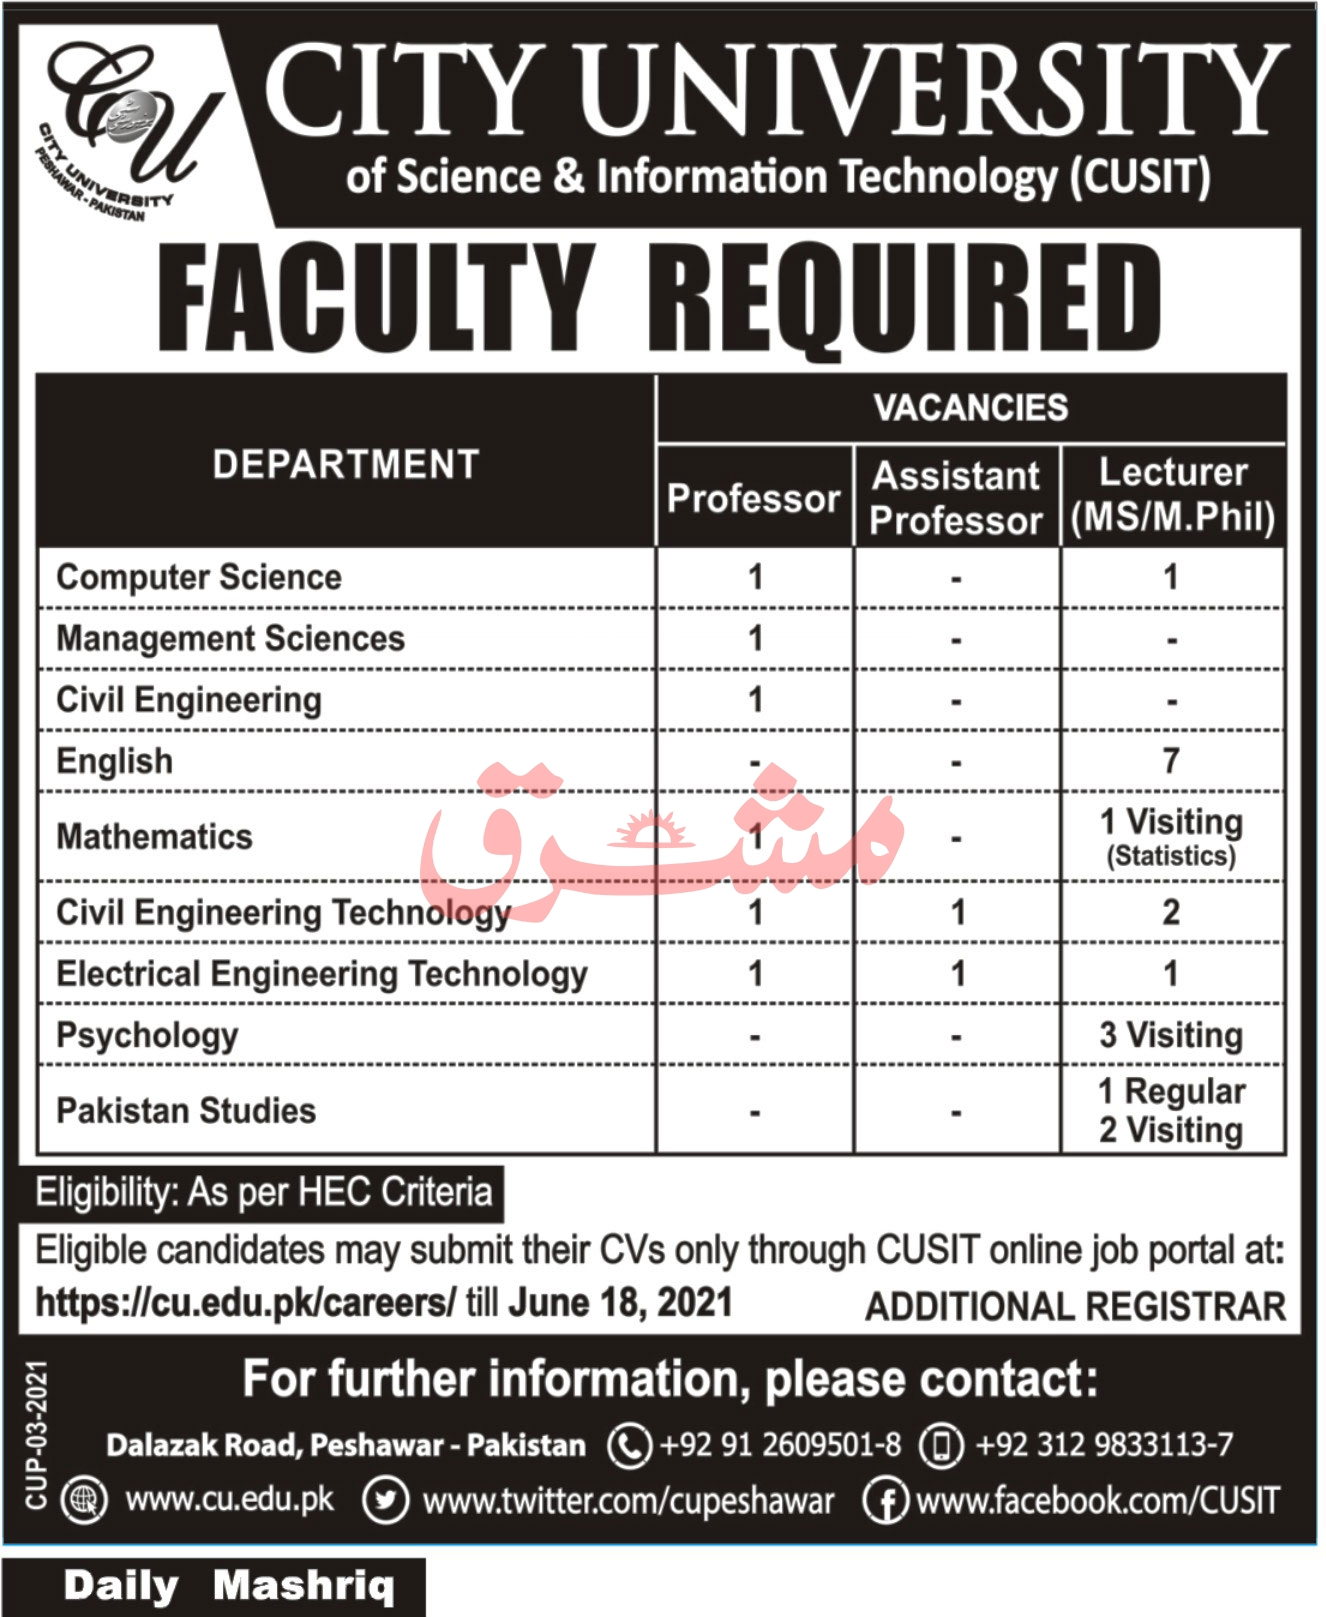 https://cu.edu.pk/careers/ - City University Of Science And Technology (CUSIT) Jobs 2021 in Pakistan